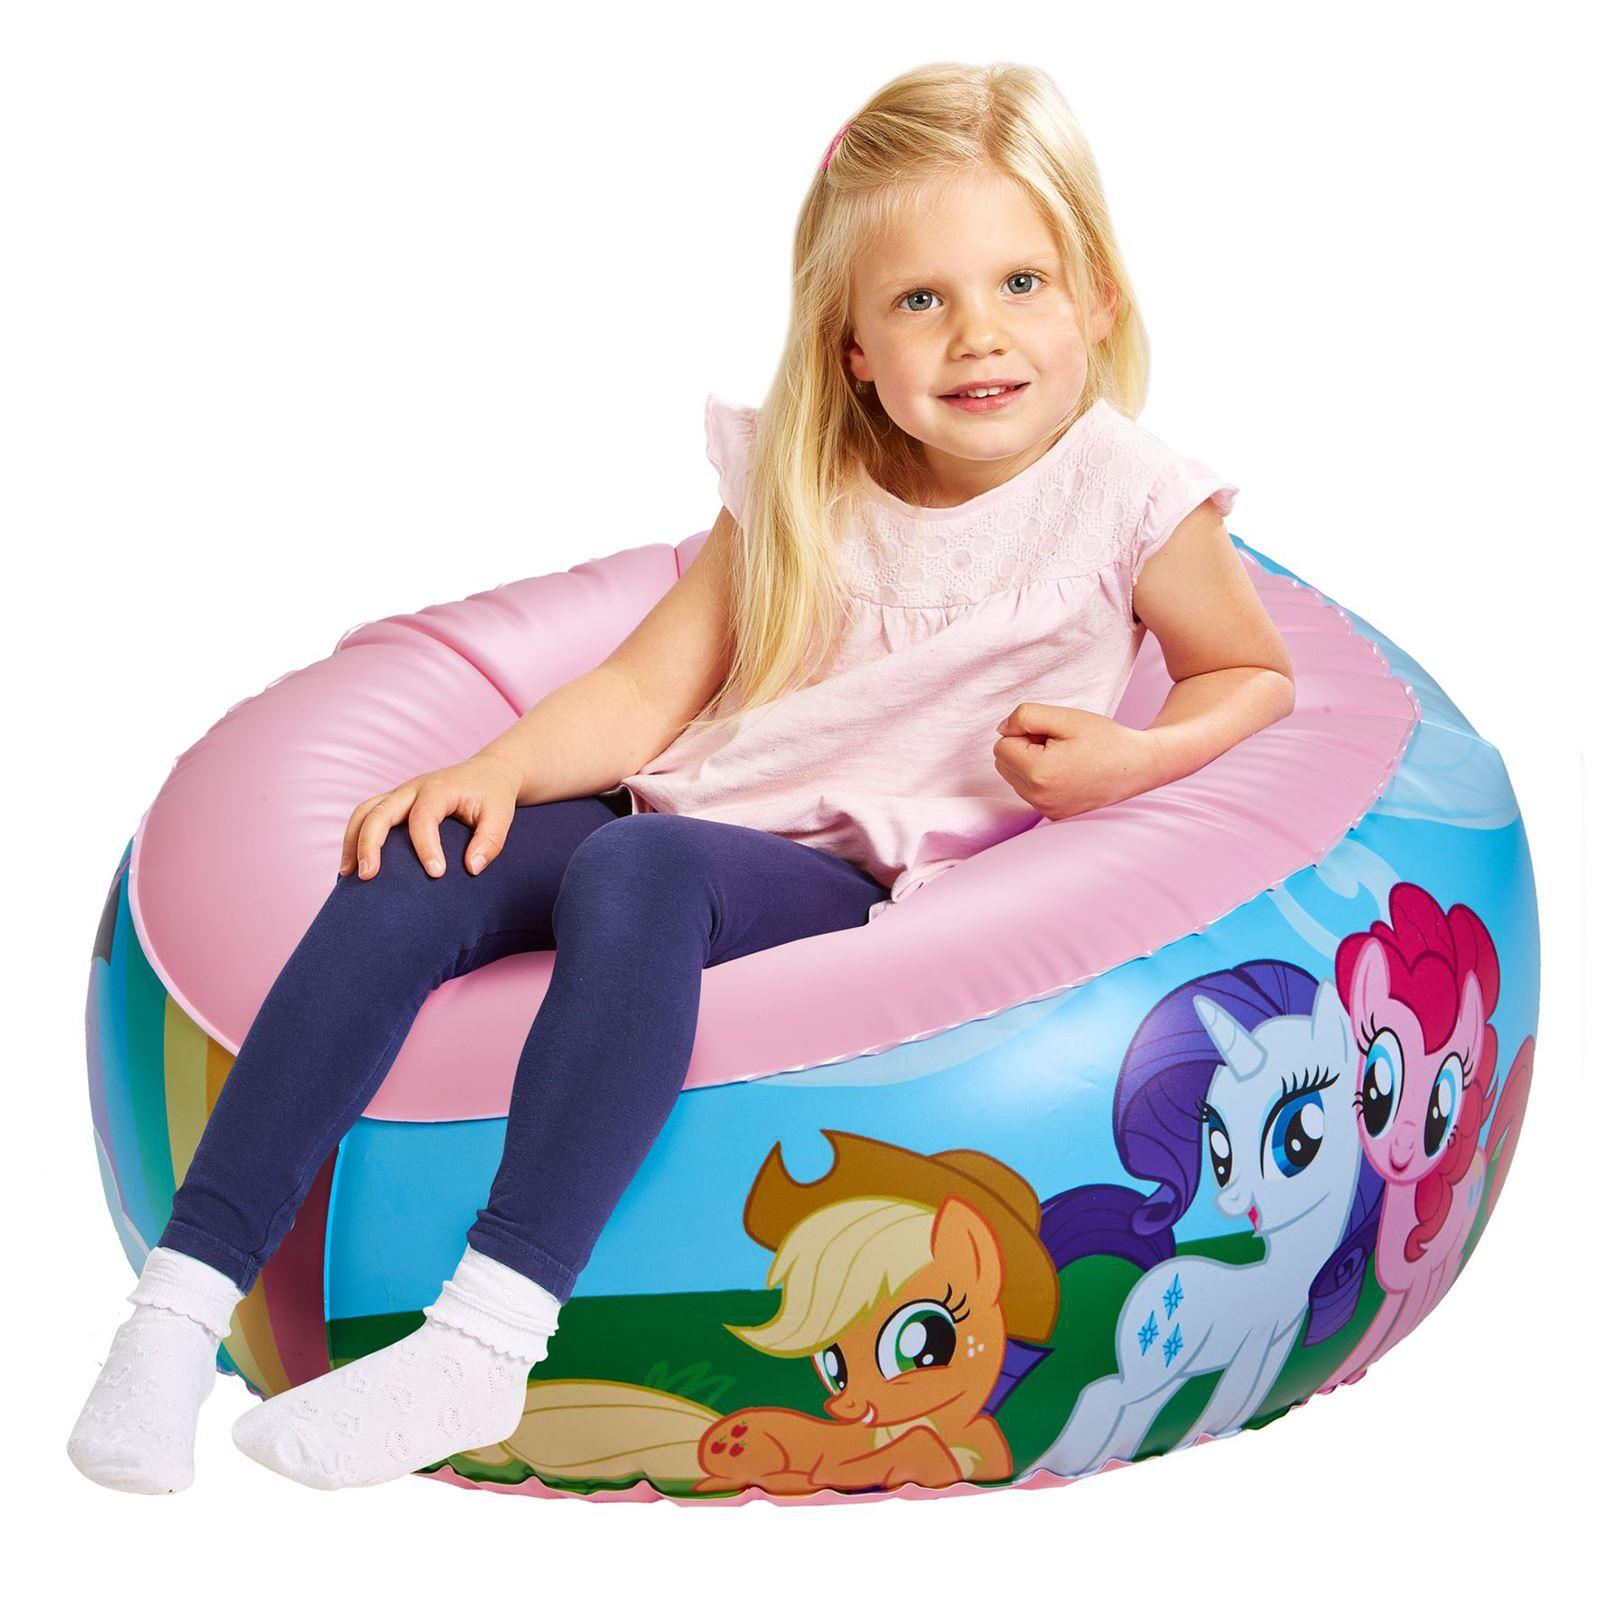 star wars bean bag chair stool fantastic furniture kids junior lightweight inflatable paw patrol my